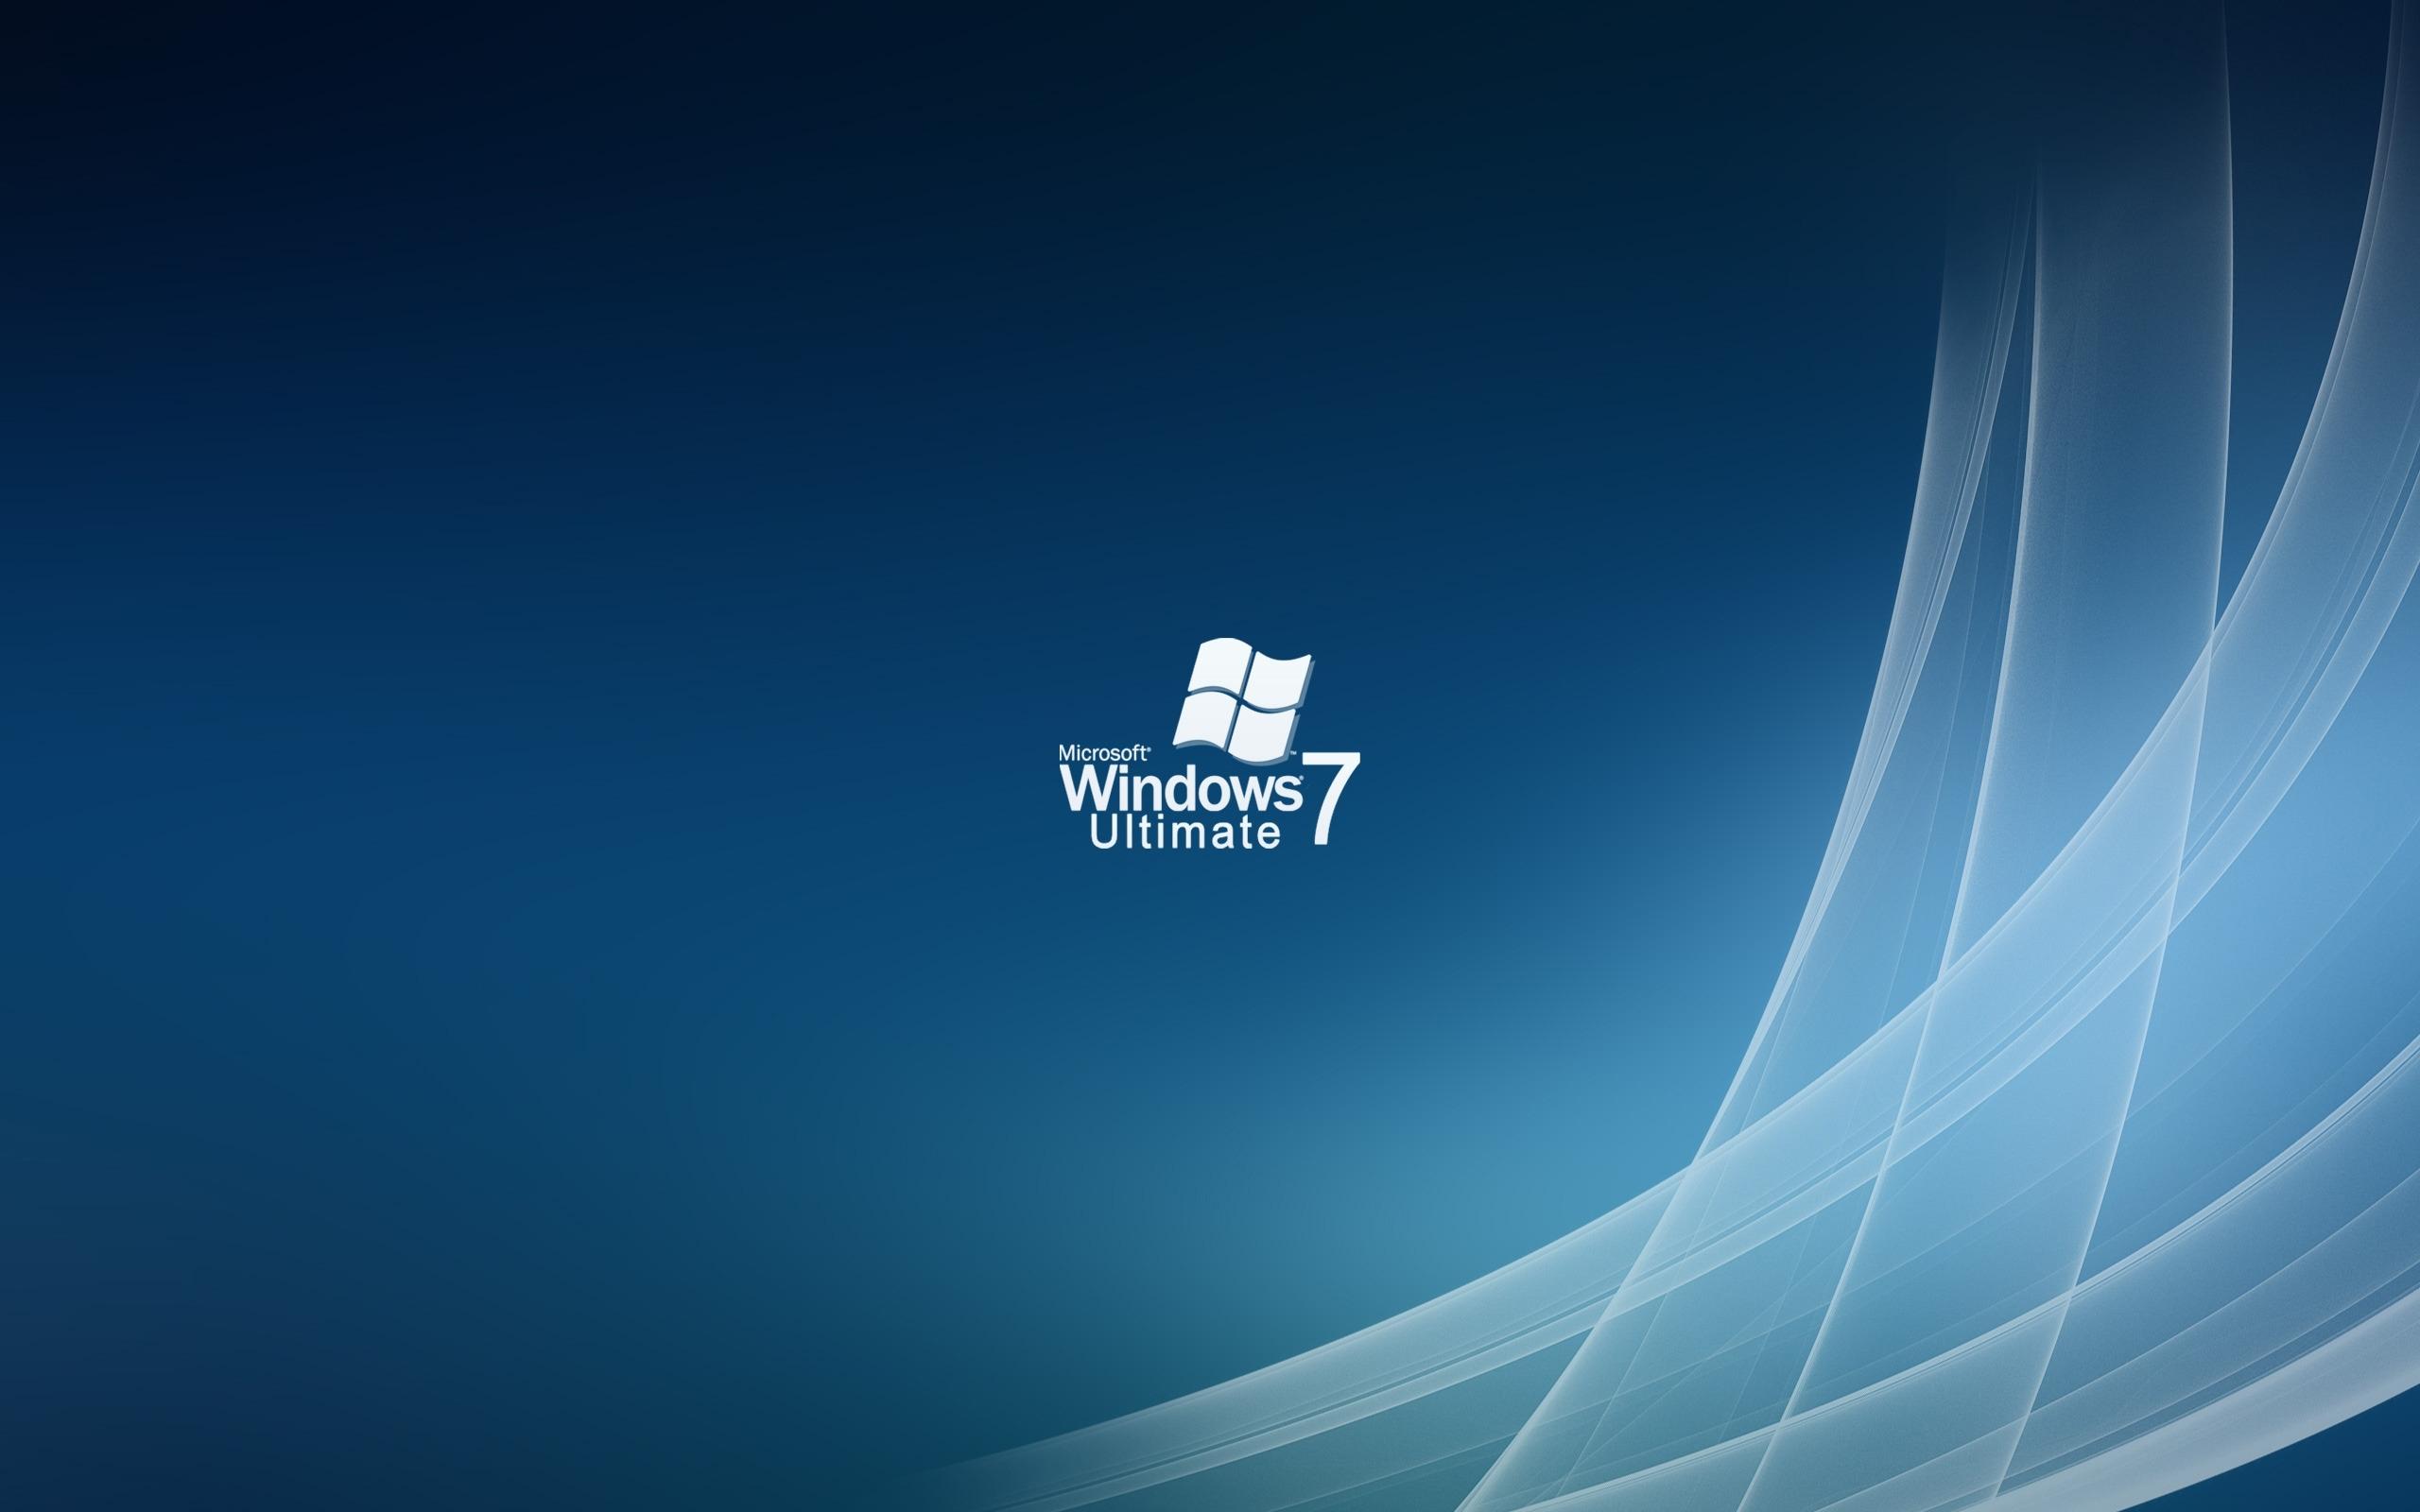 10 New Windows 7 Ultimate Wallpaper 1920X1080 FULL HD 1920